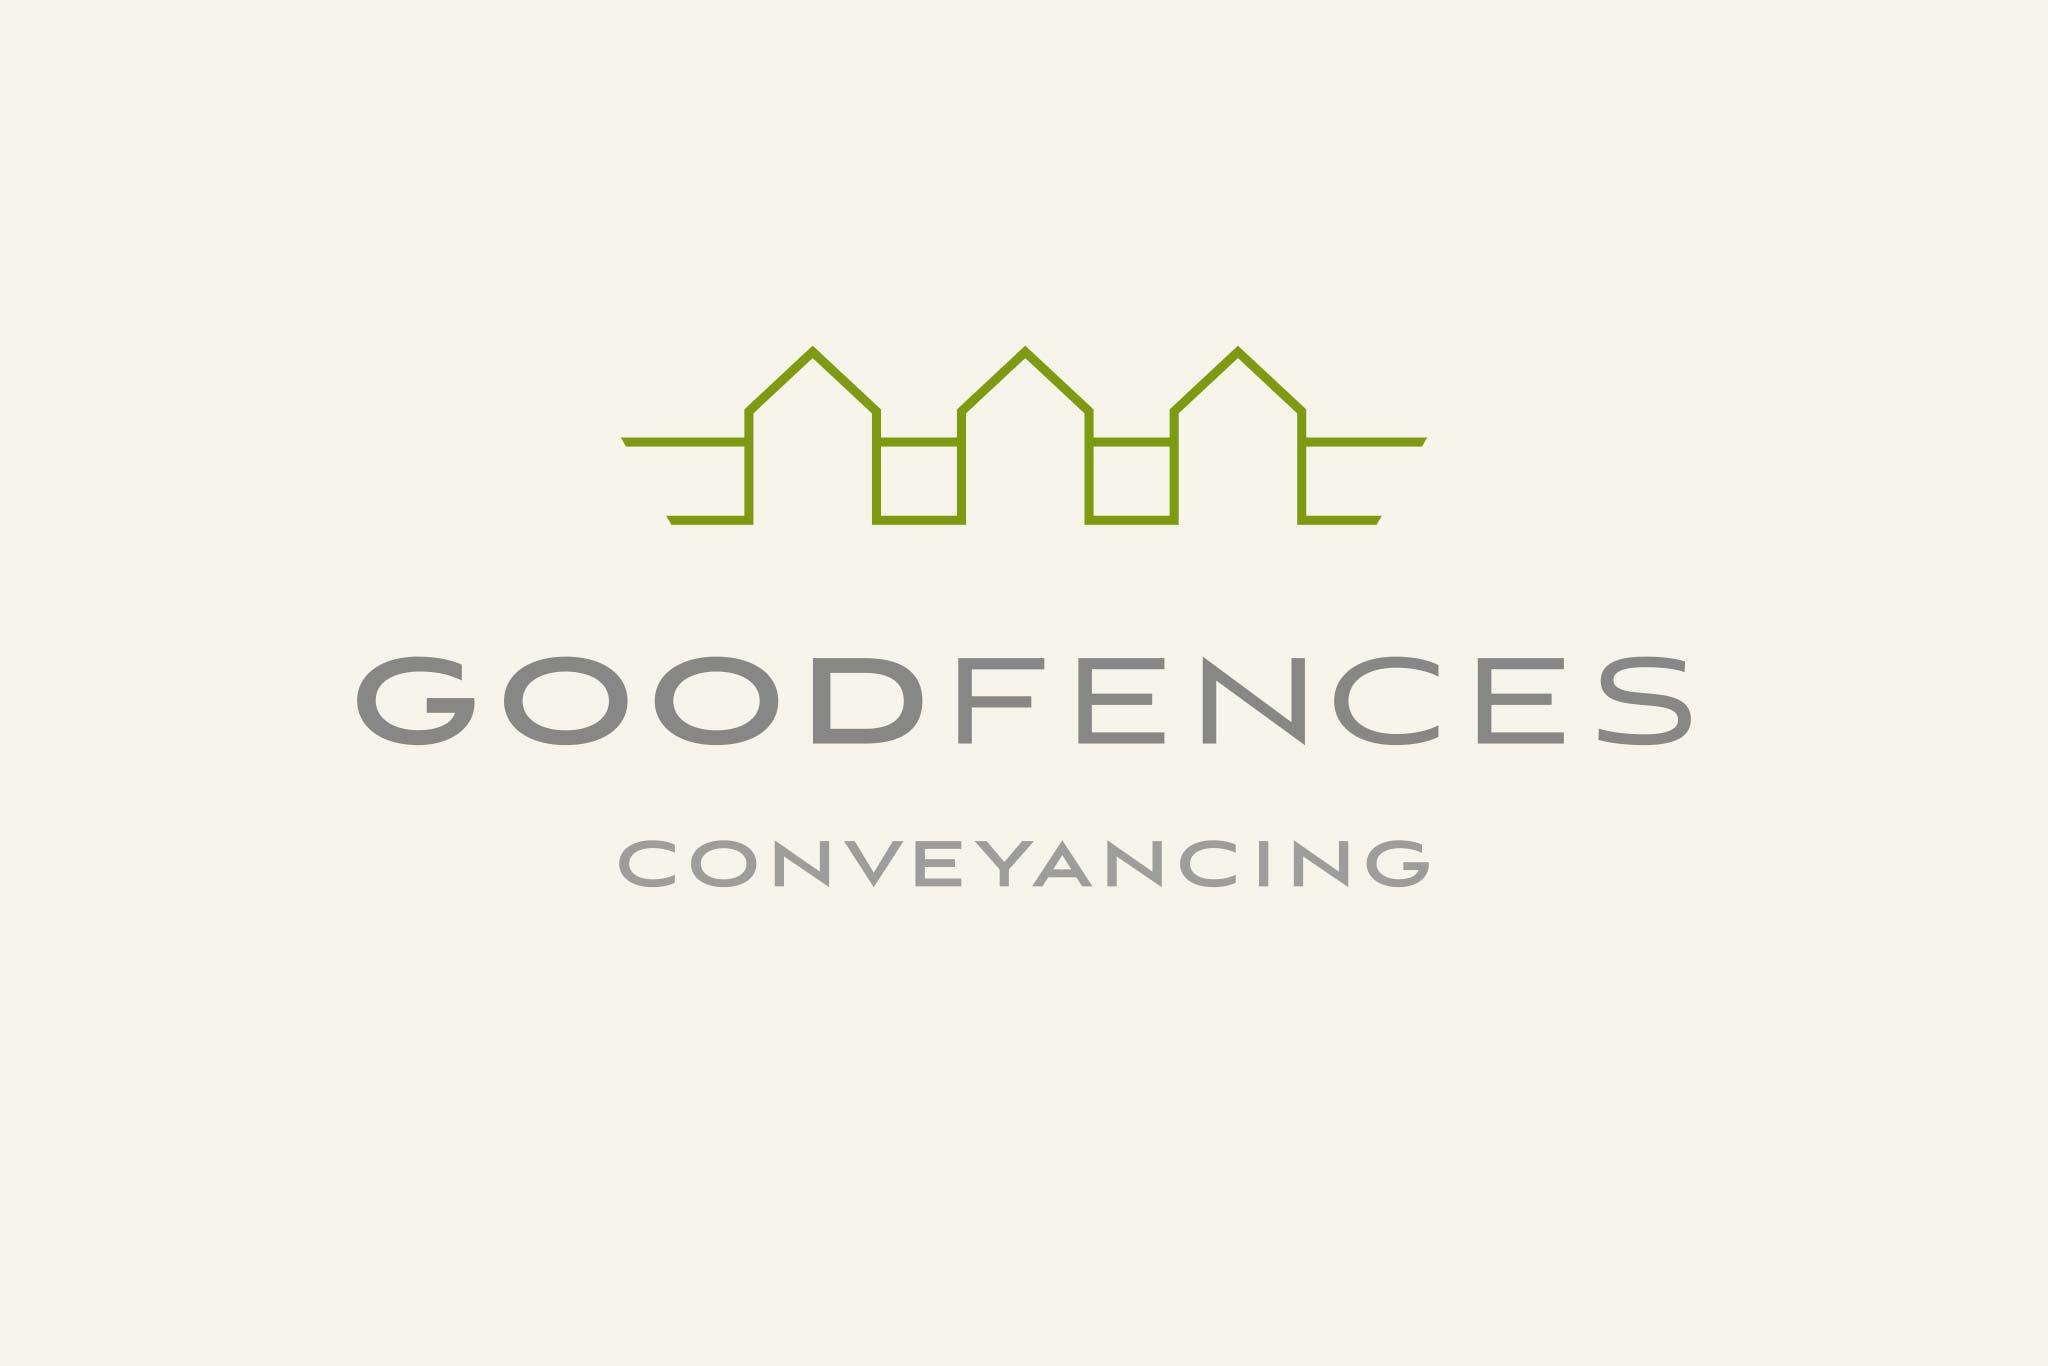 goodfences-conveyancing-branding_1